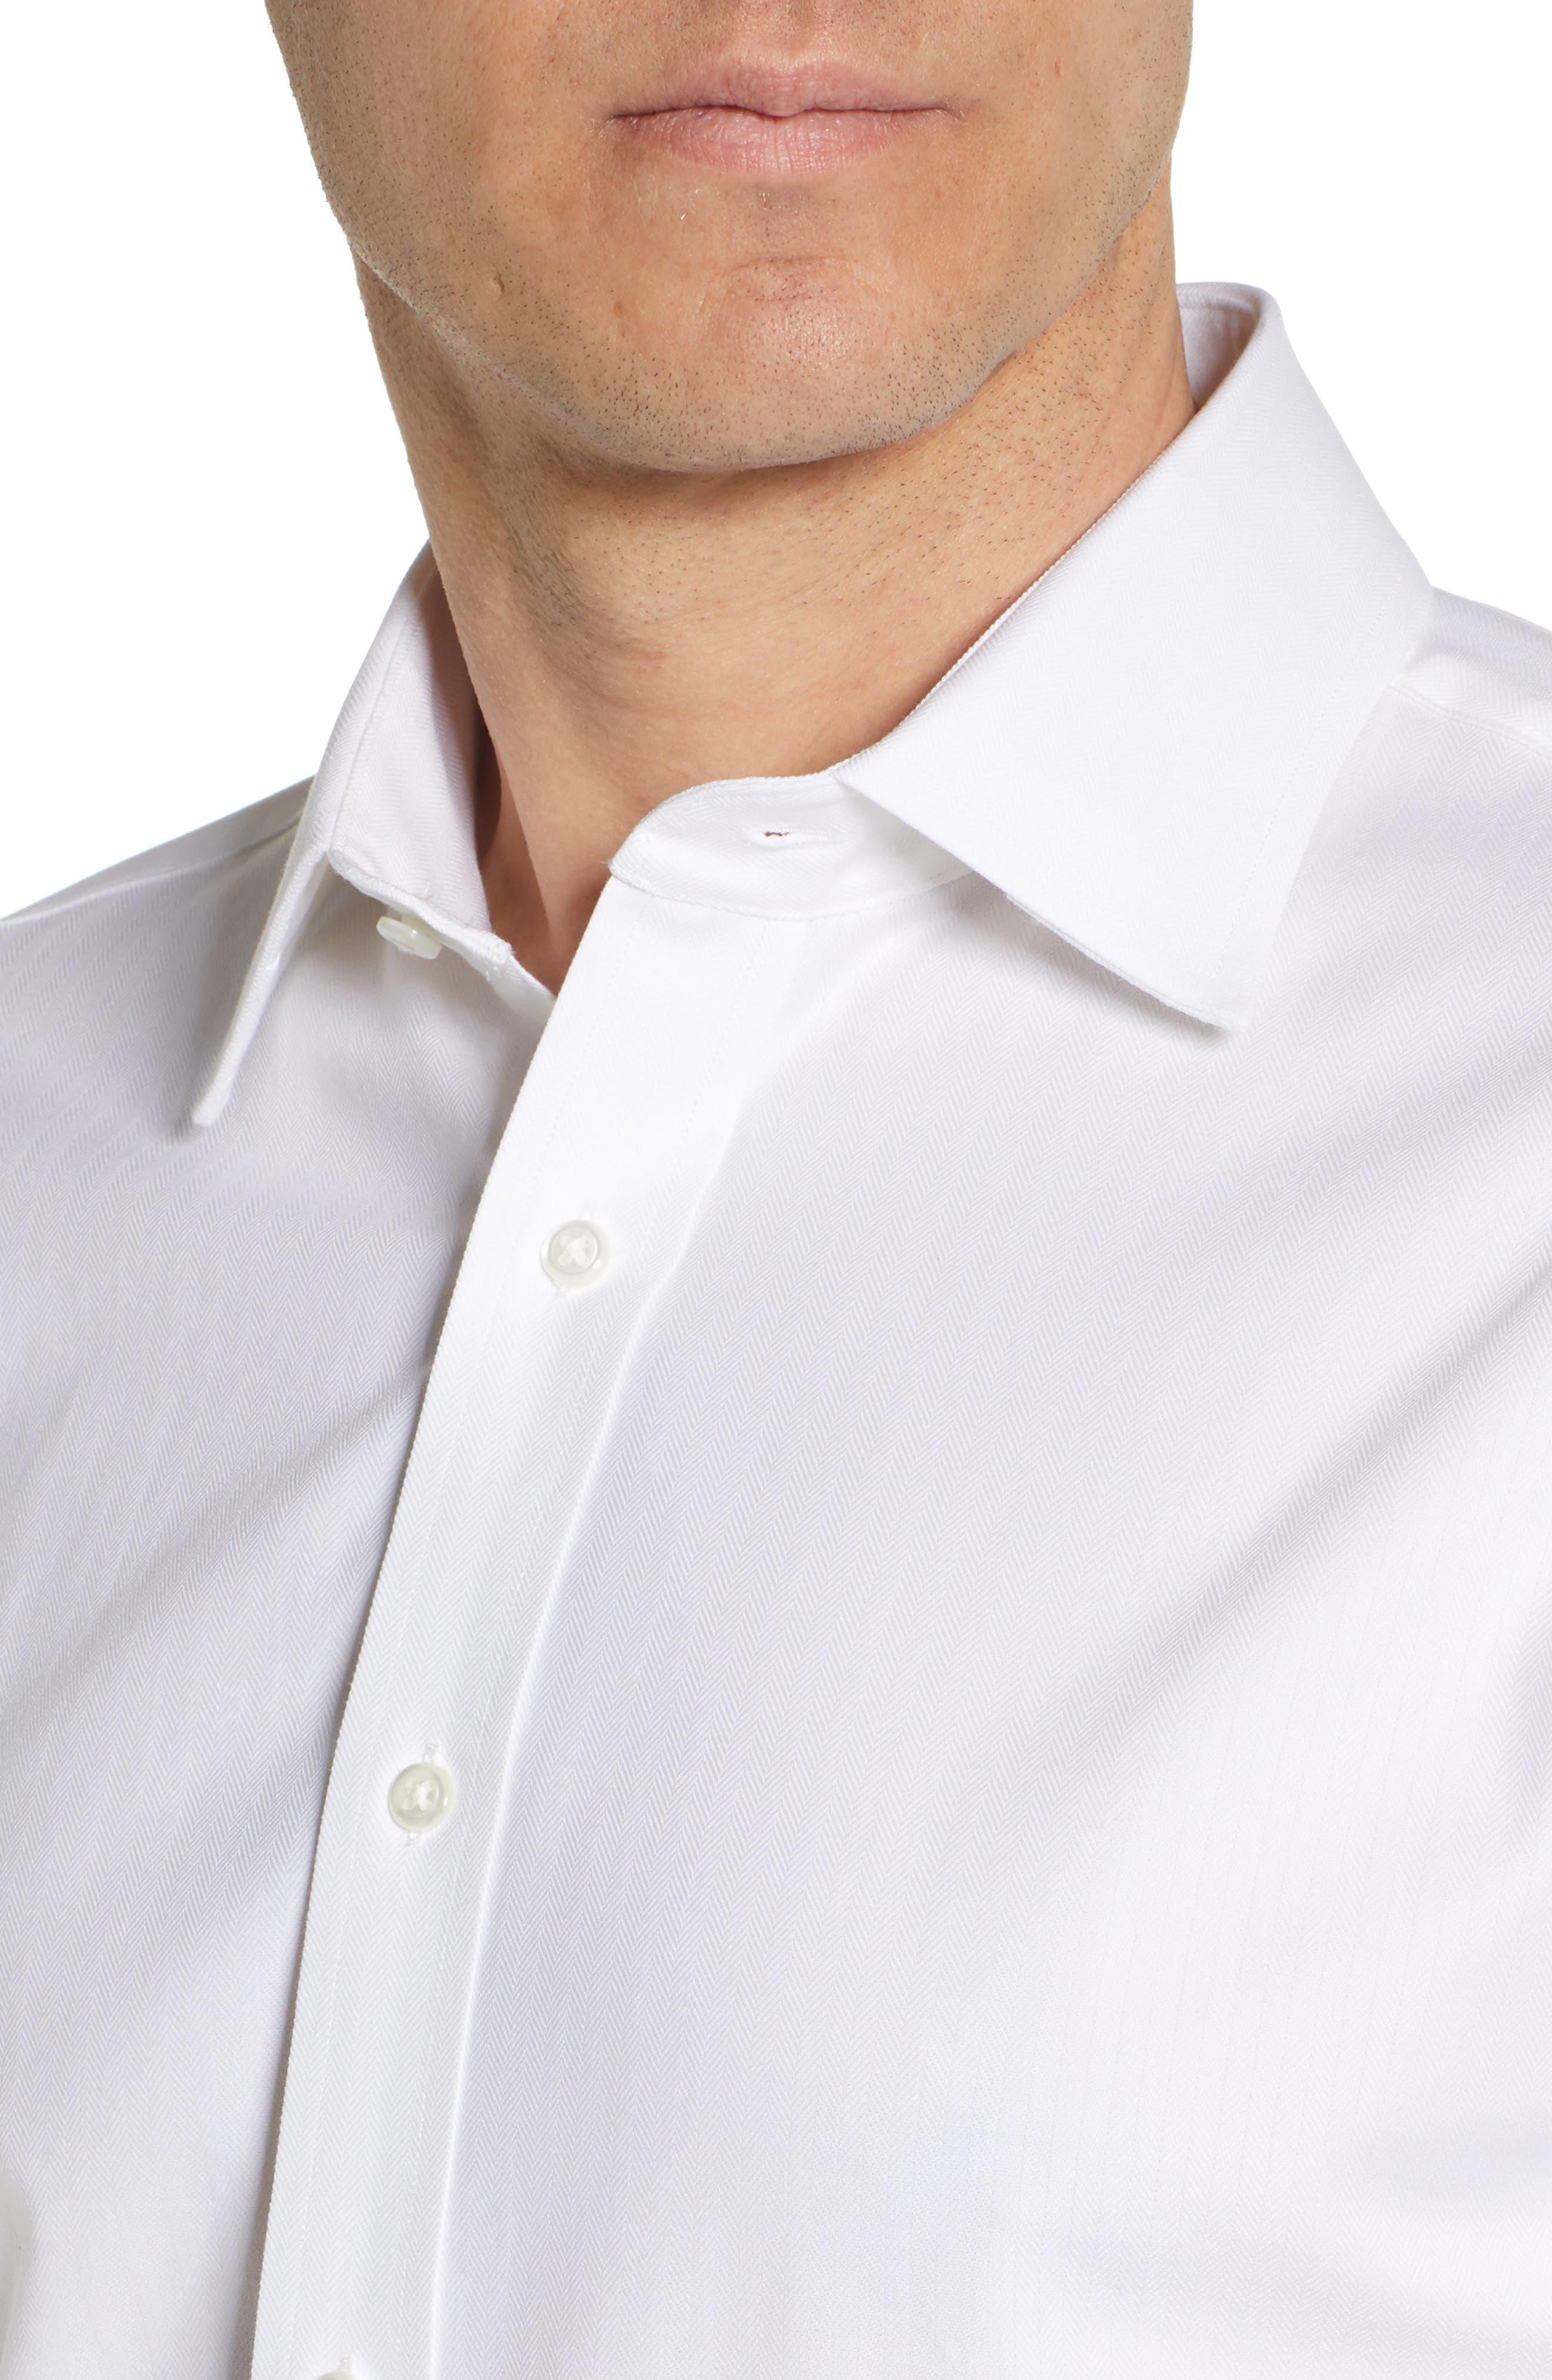 NORDSTROM MEN'S SHOP, Tech-Smart Traditional Fit Stretch Herringbone Dress Shirt, Alternate thumbnail 2, color, WHITE